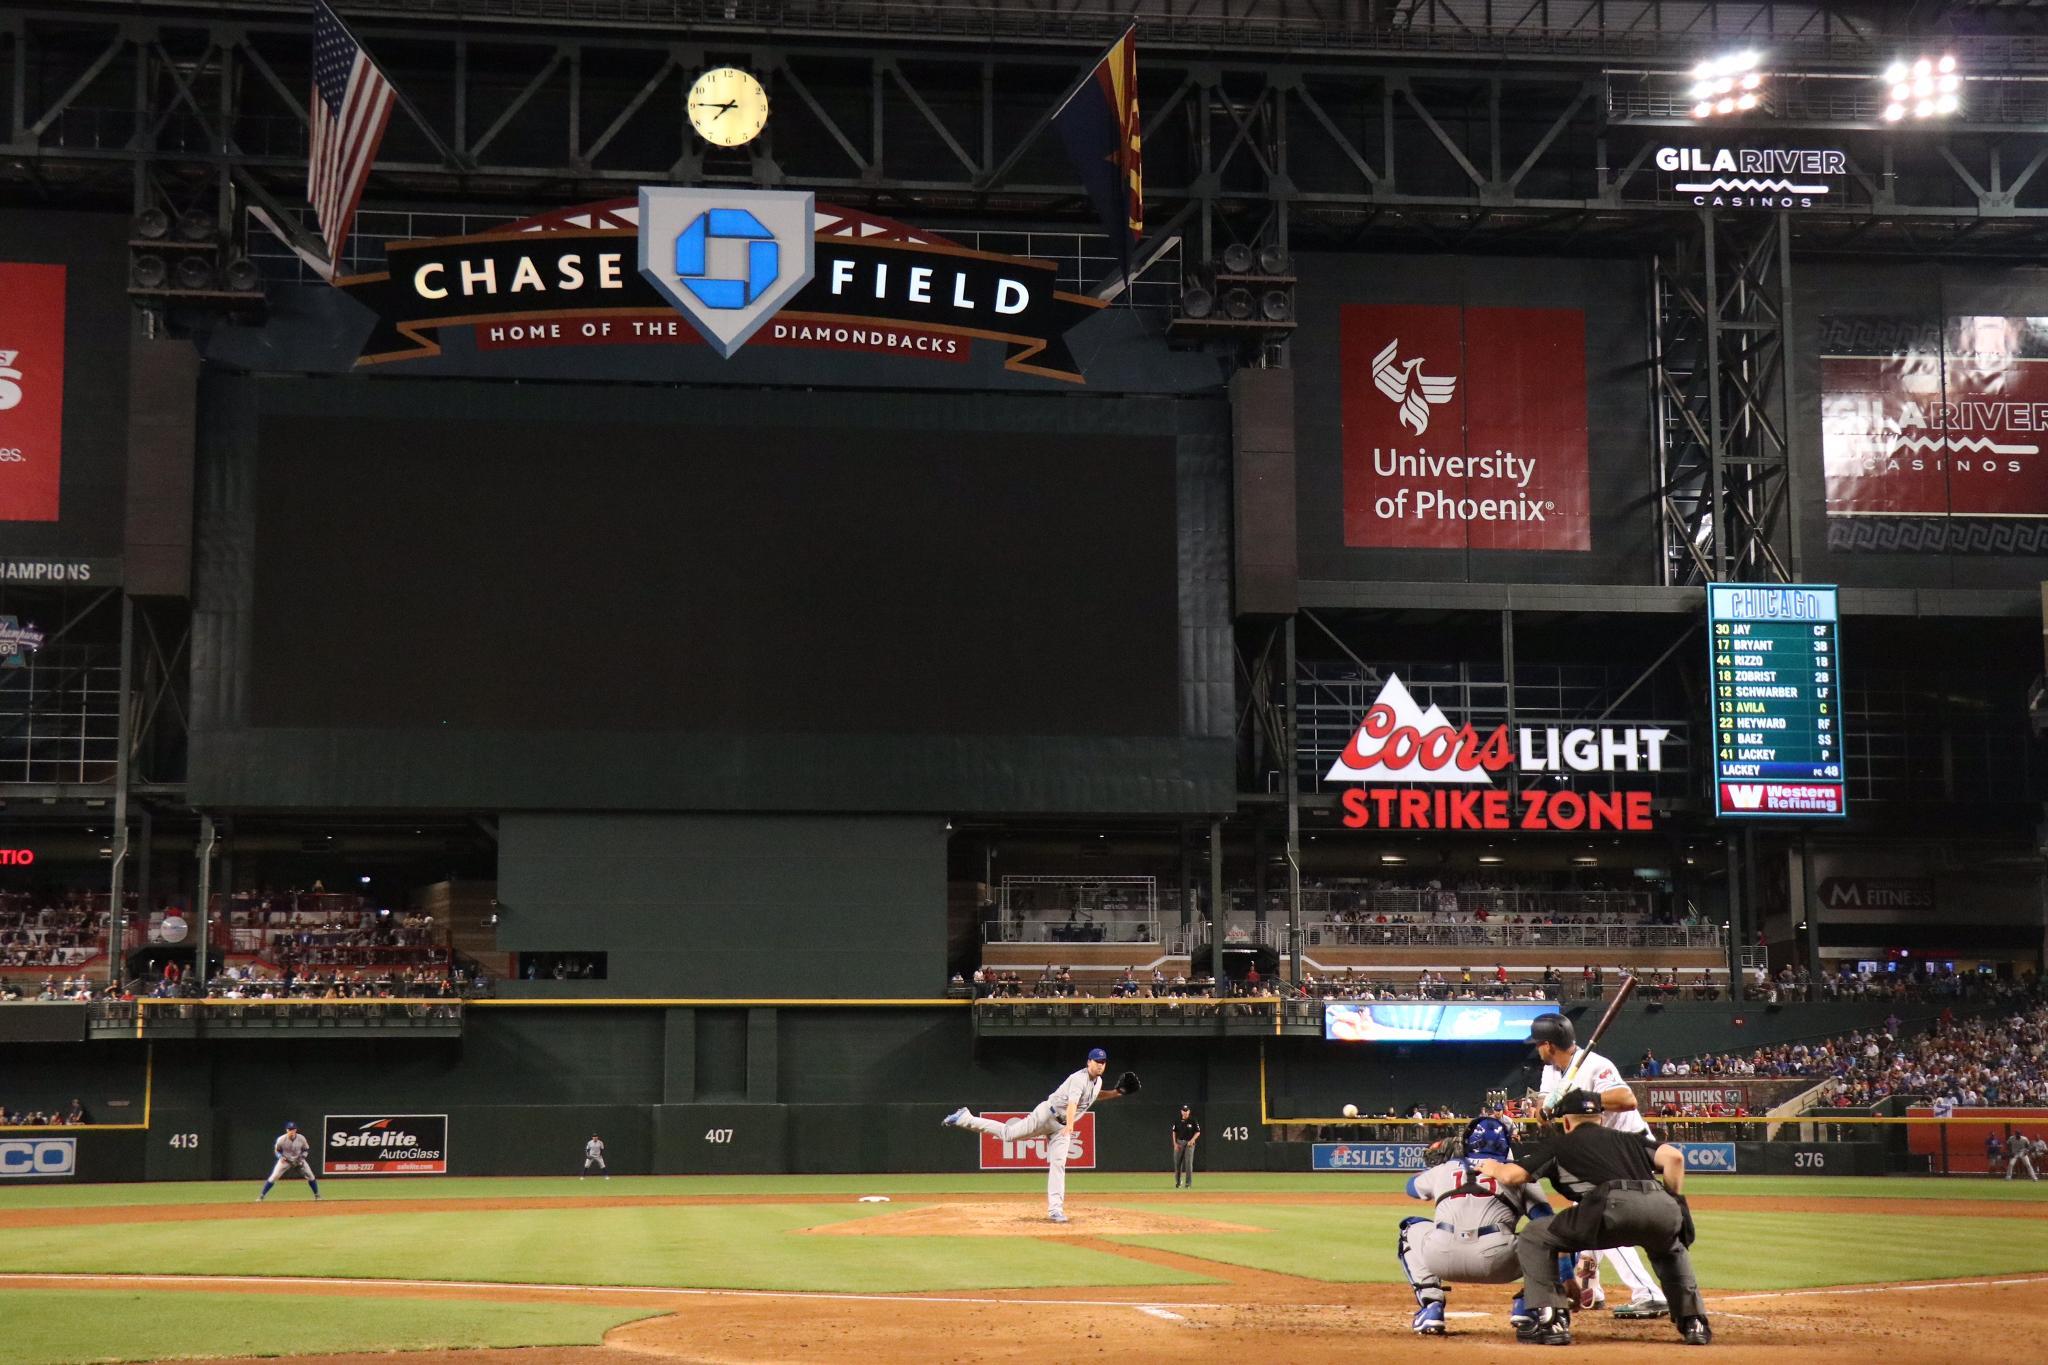 After five innings in the desert:  #Cubs 3, #Dbacks 2. https://t.co/y8iV6JkLVz https://t.co/IolZbLkN9f